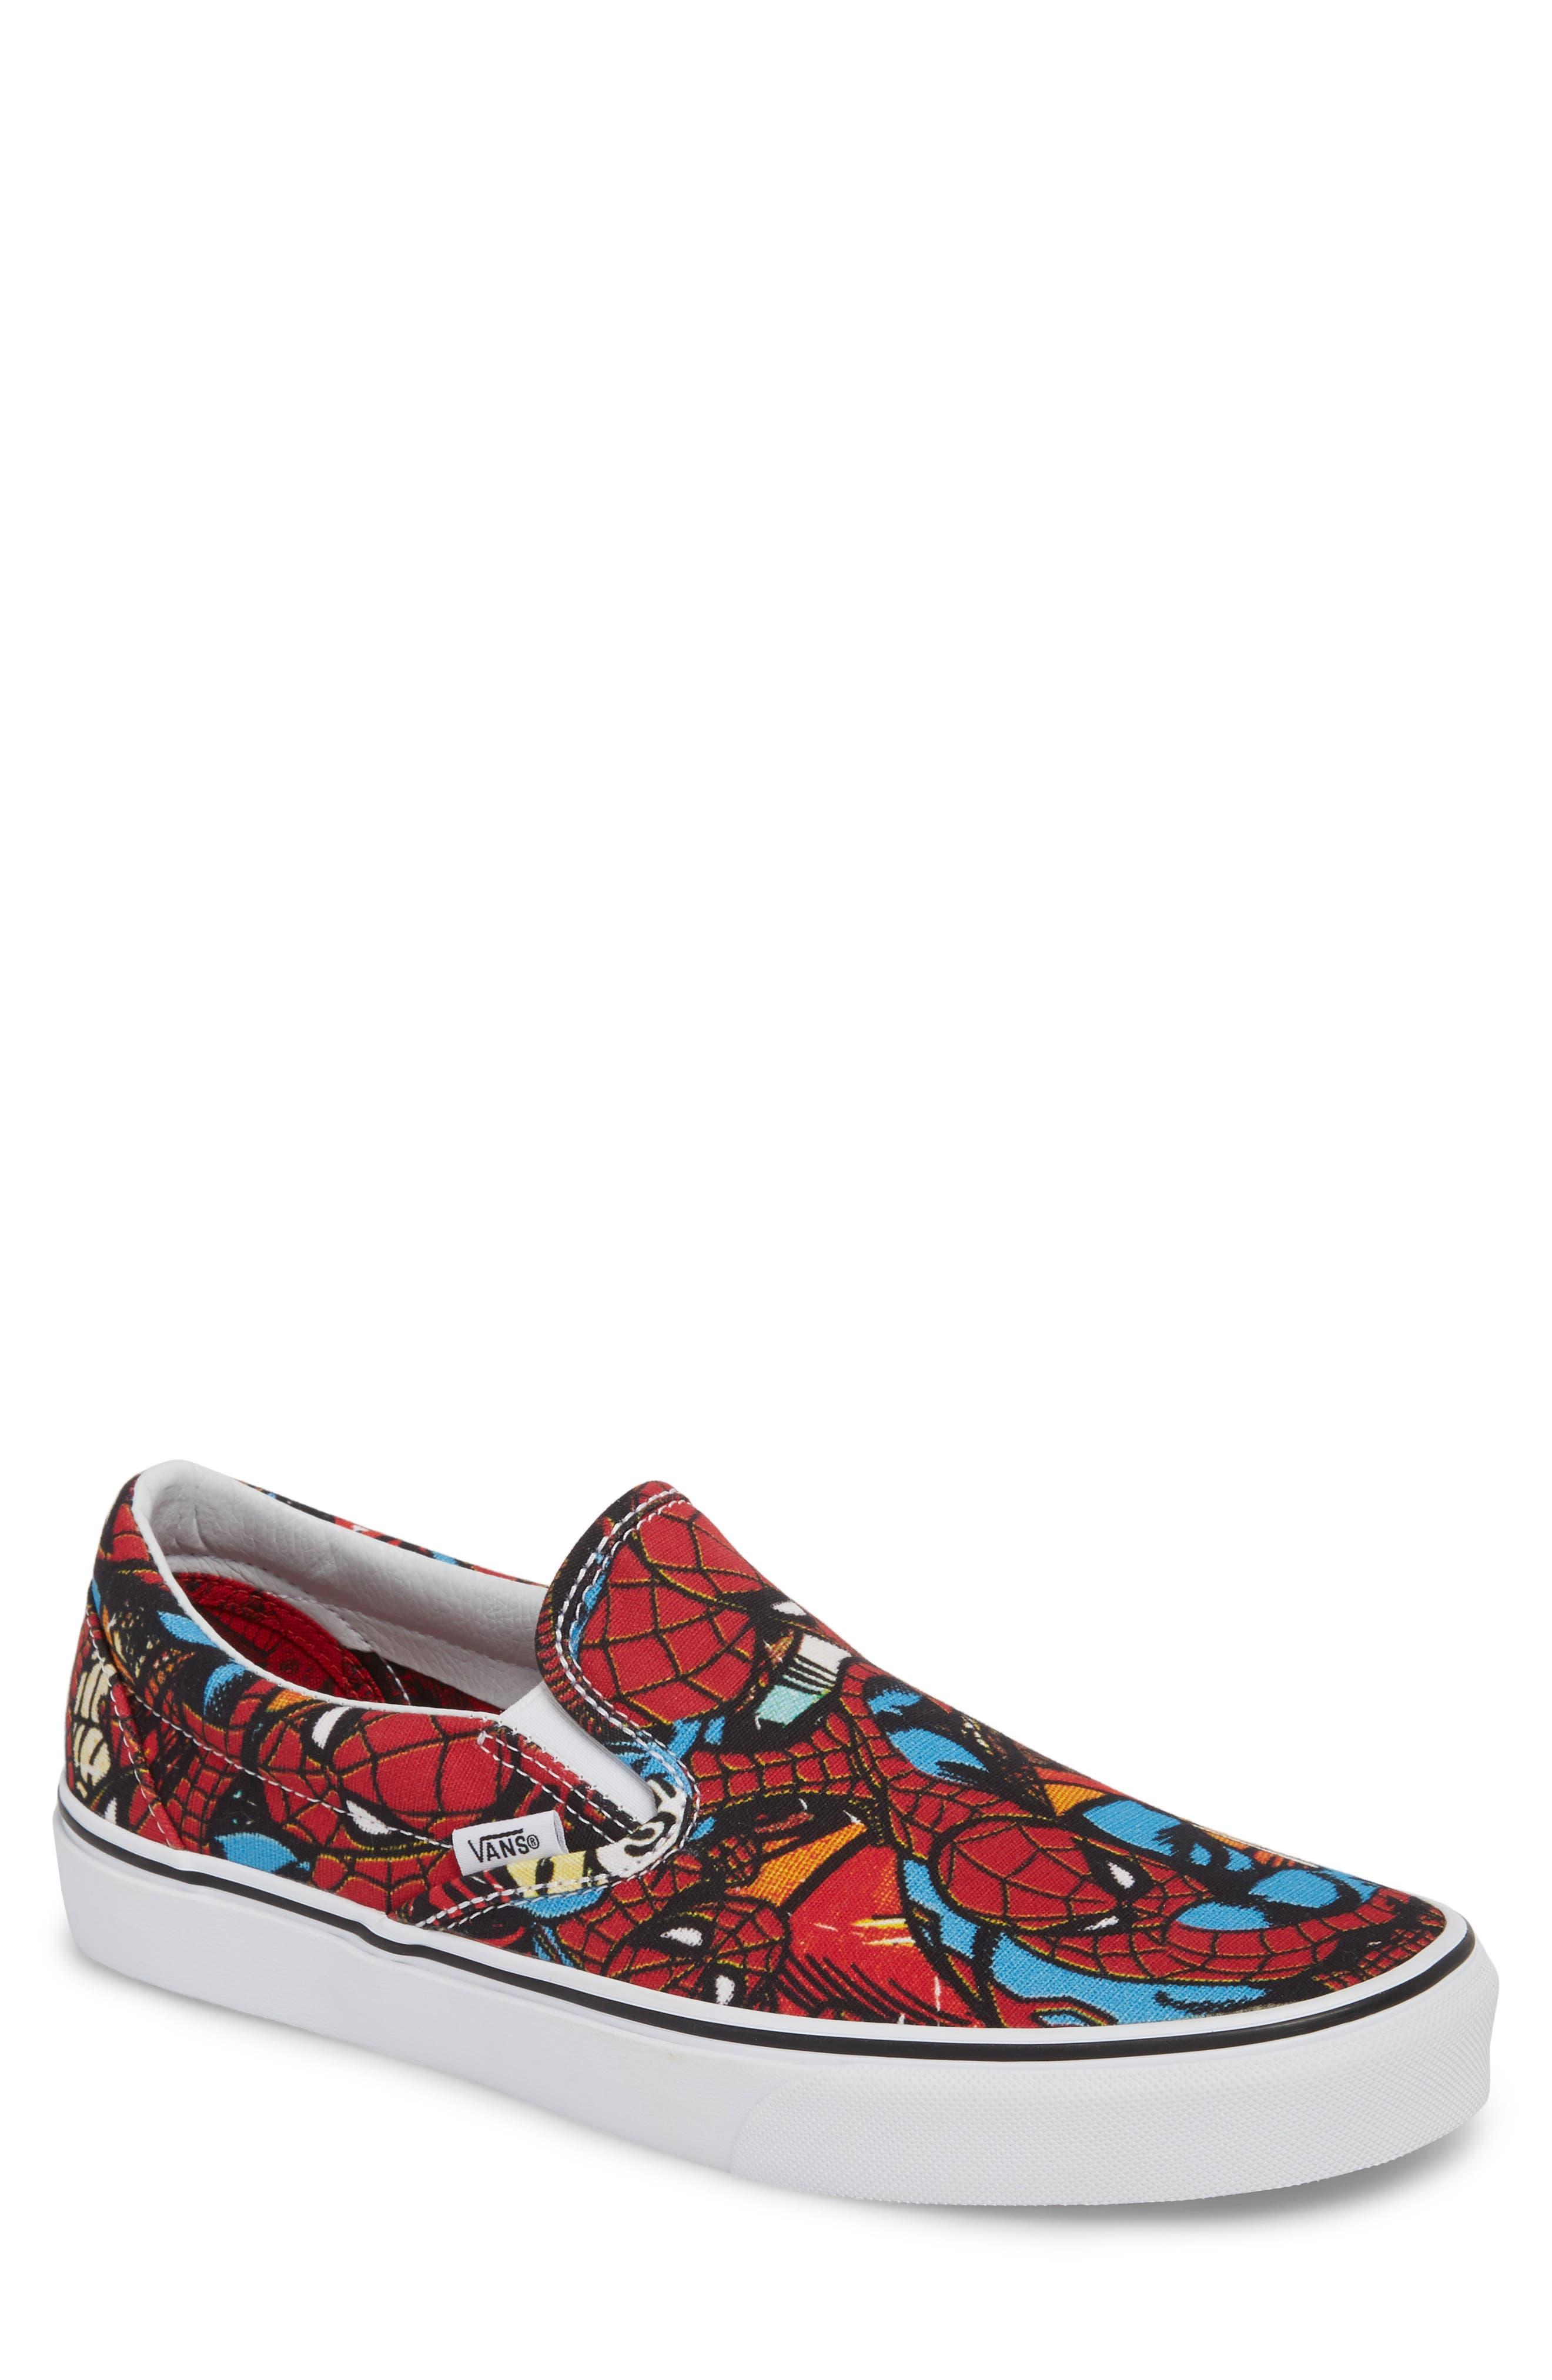 Marvel UA Classic Slip-On Sneaker,                             Main thumbnail 2, color,